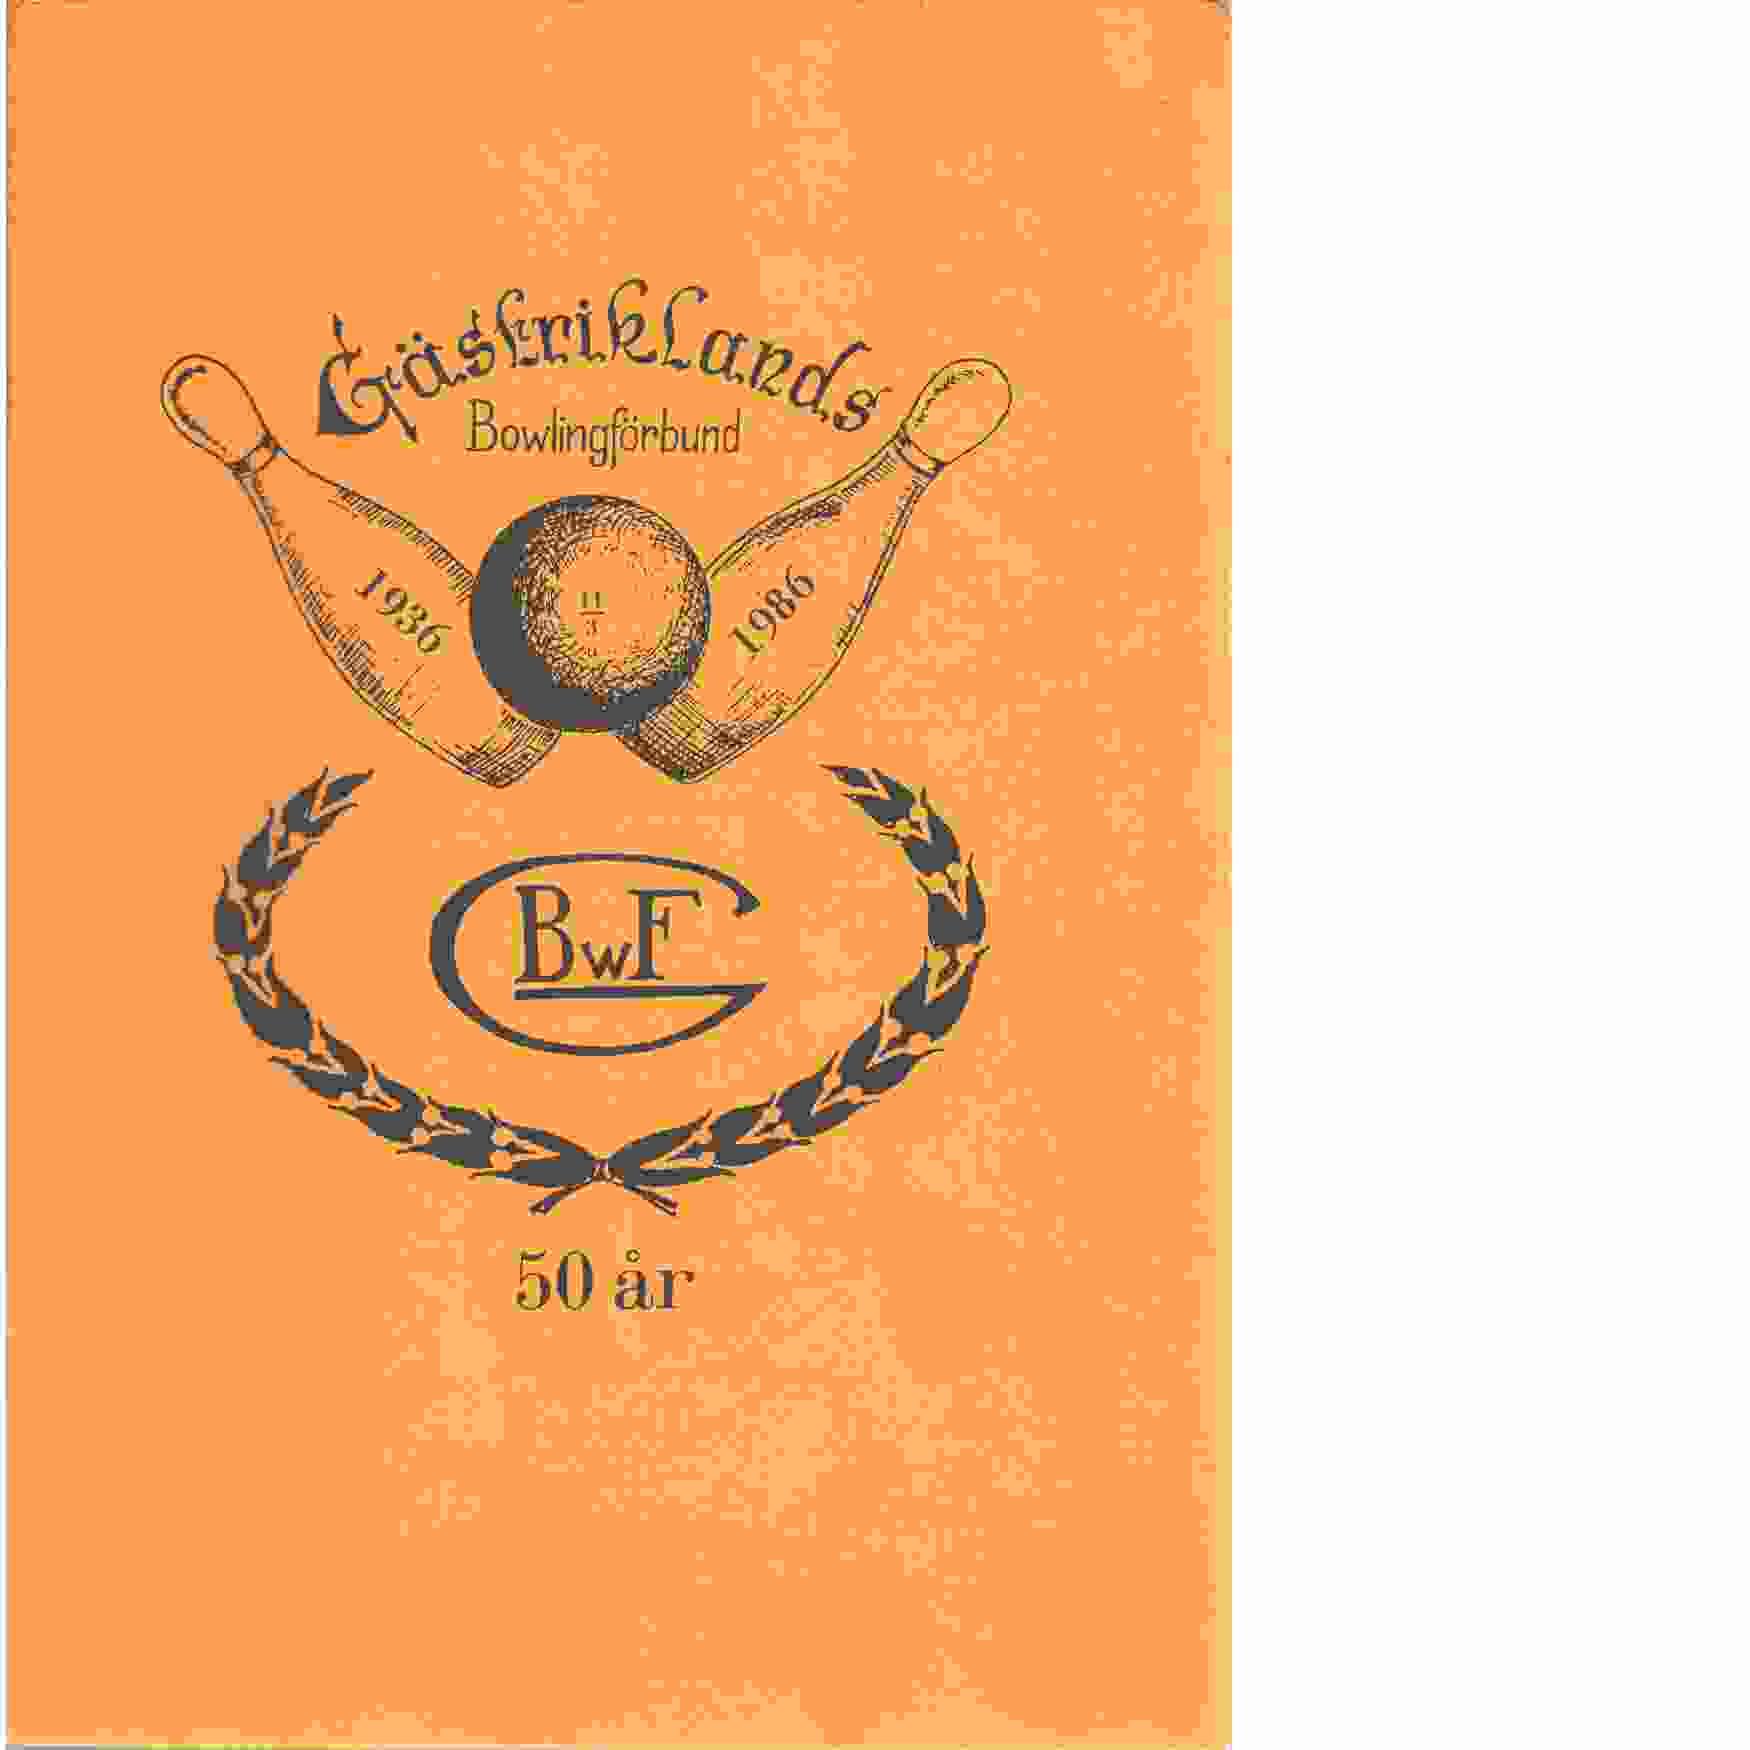 Gästriklands Bowlingsförbunds jubileumsskrift : en historik över den gångna 50 åren - Fors, Olle